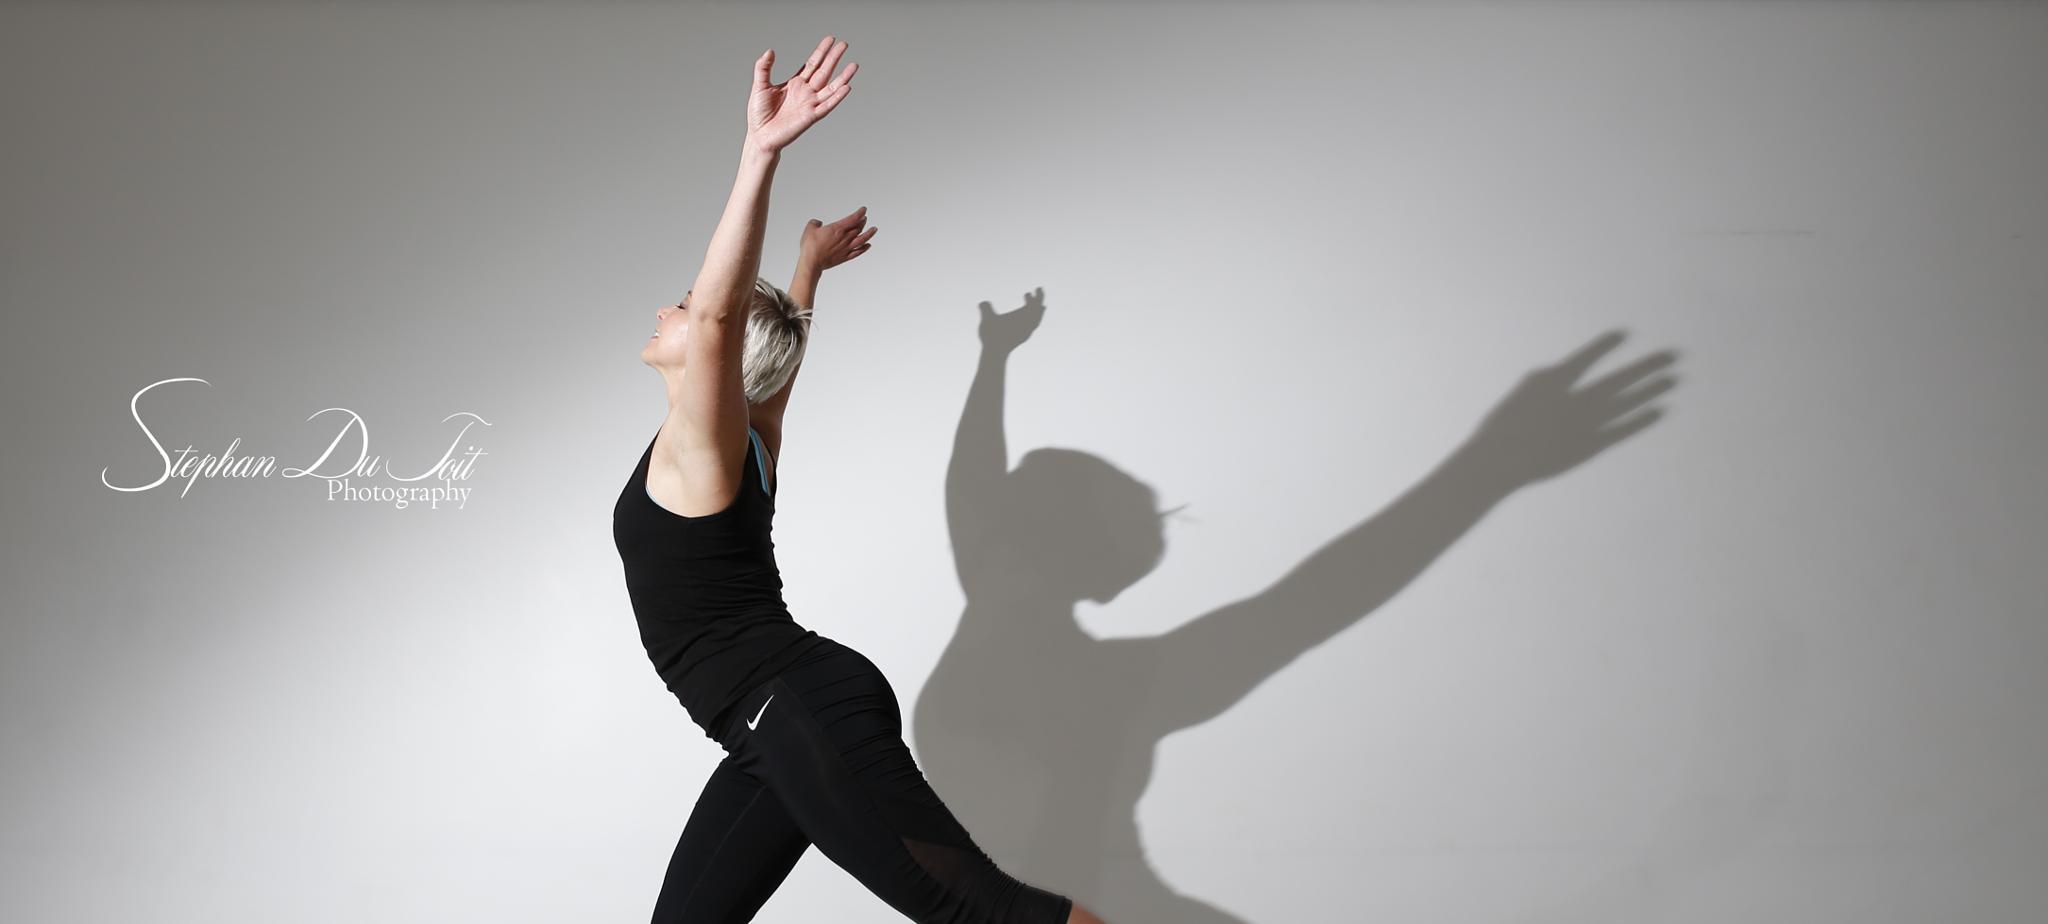 Creative Dancing by Stephan Du Toit